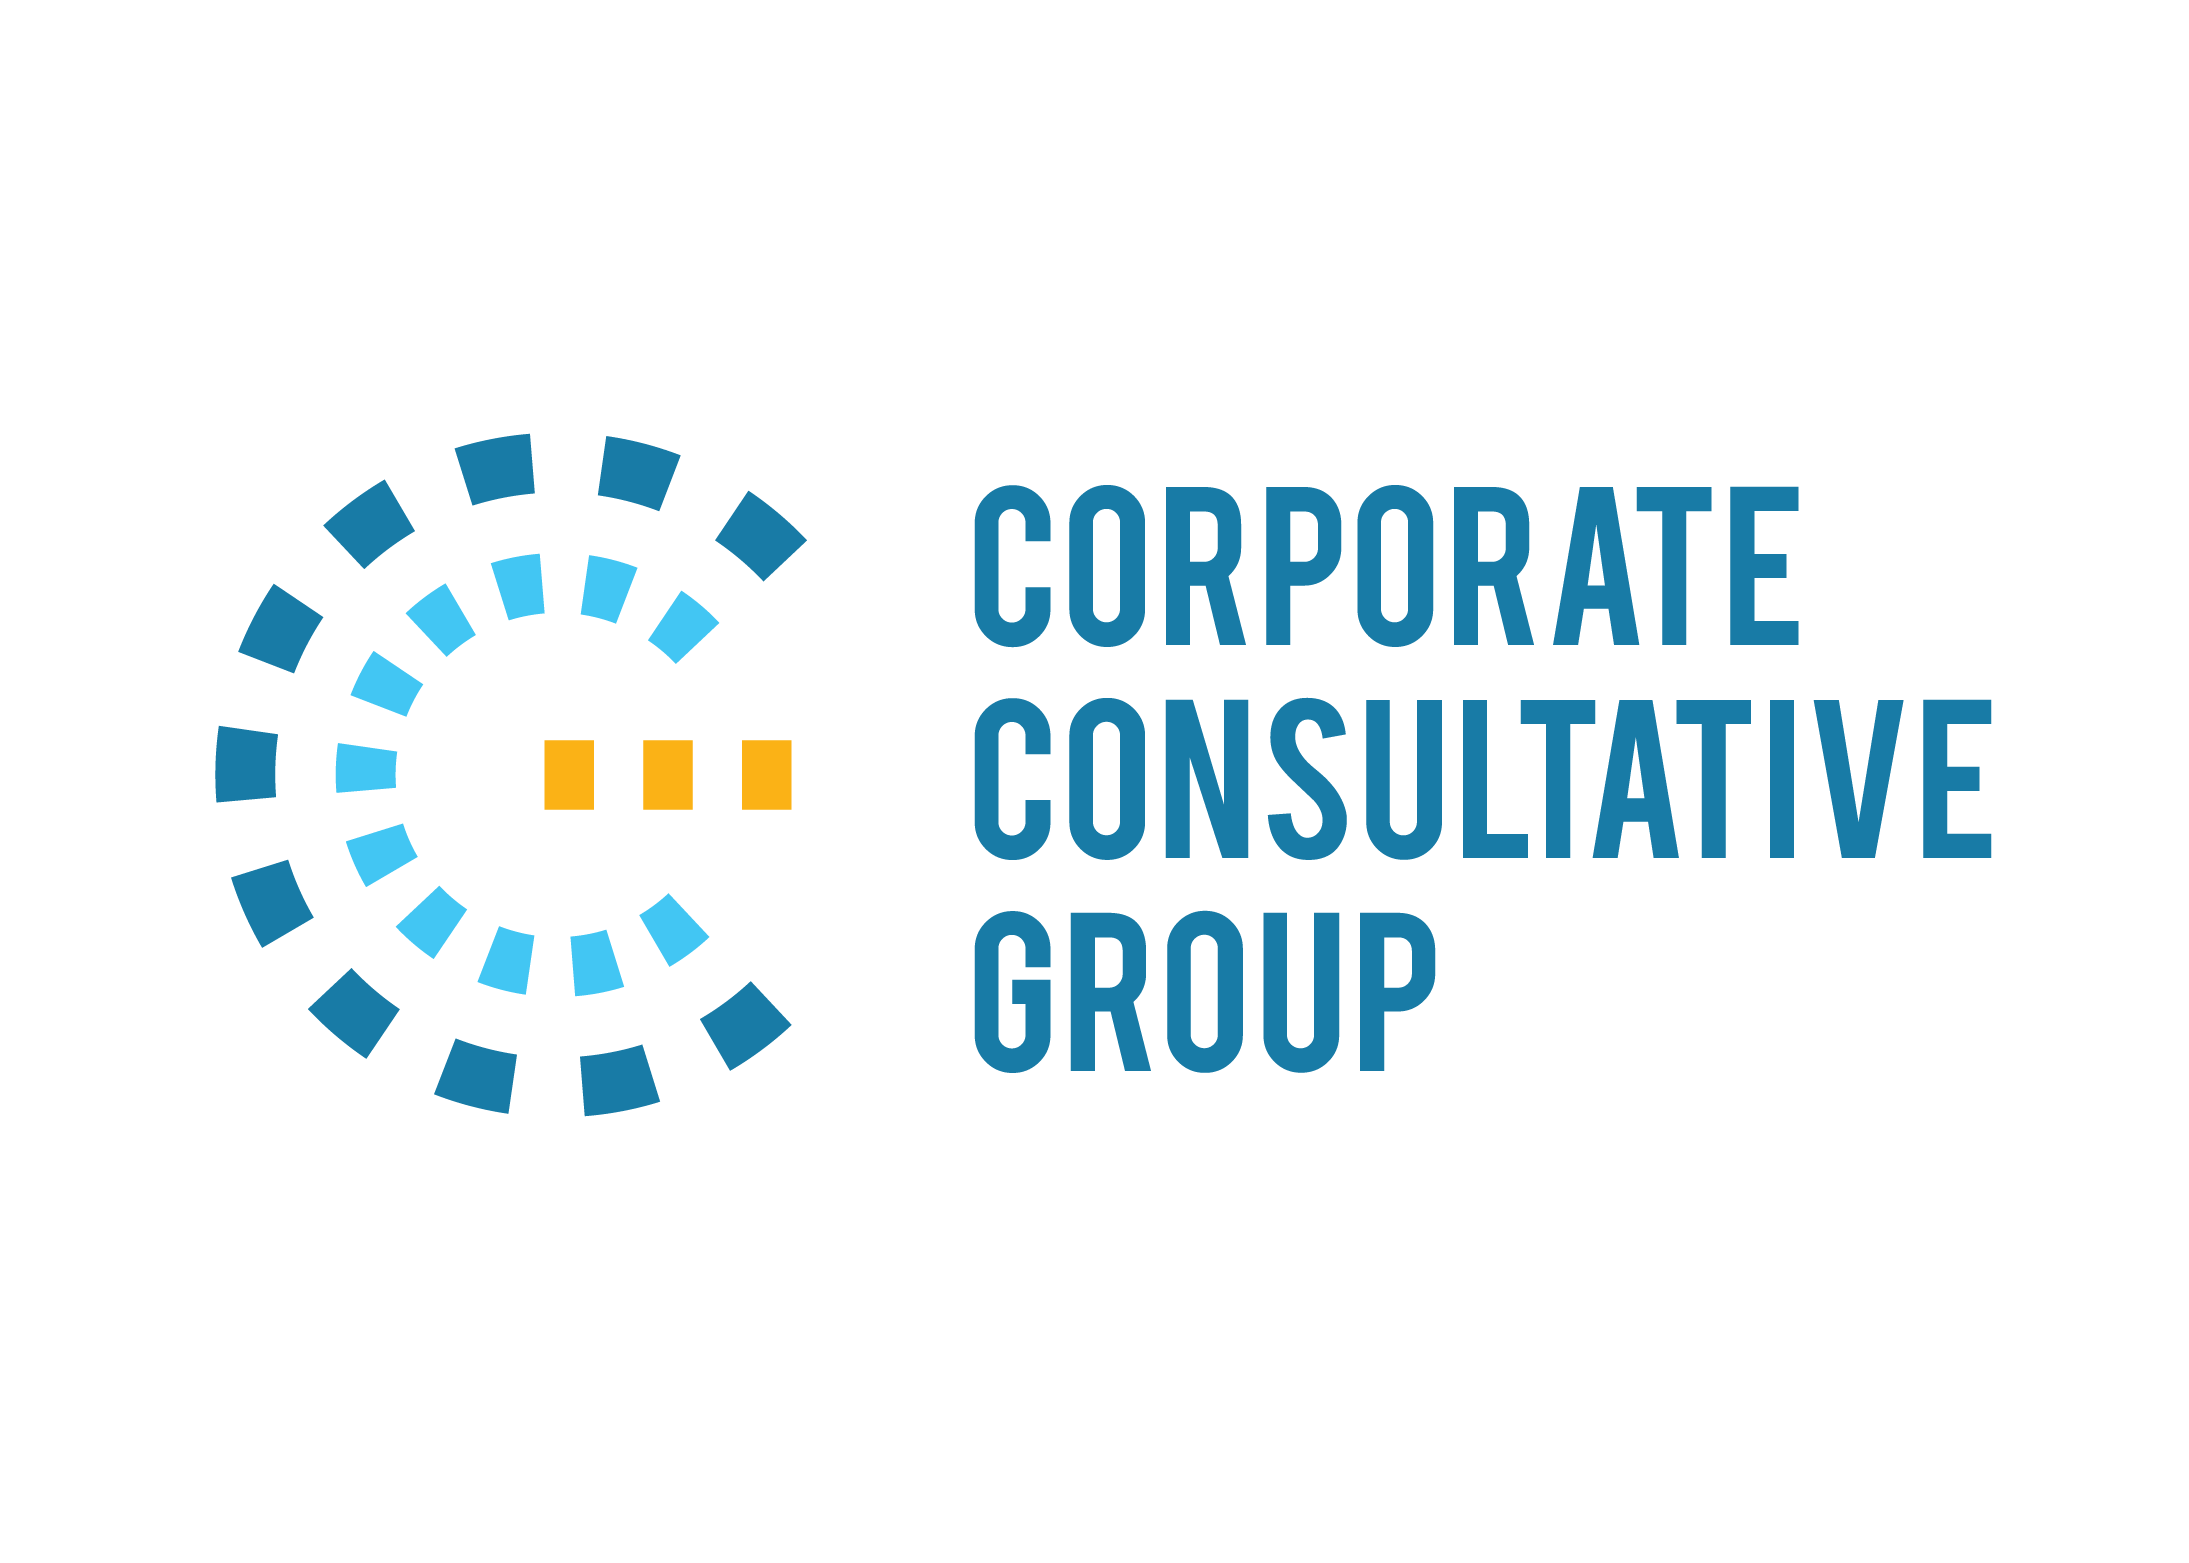 Corporate Consultative Group logo